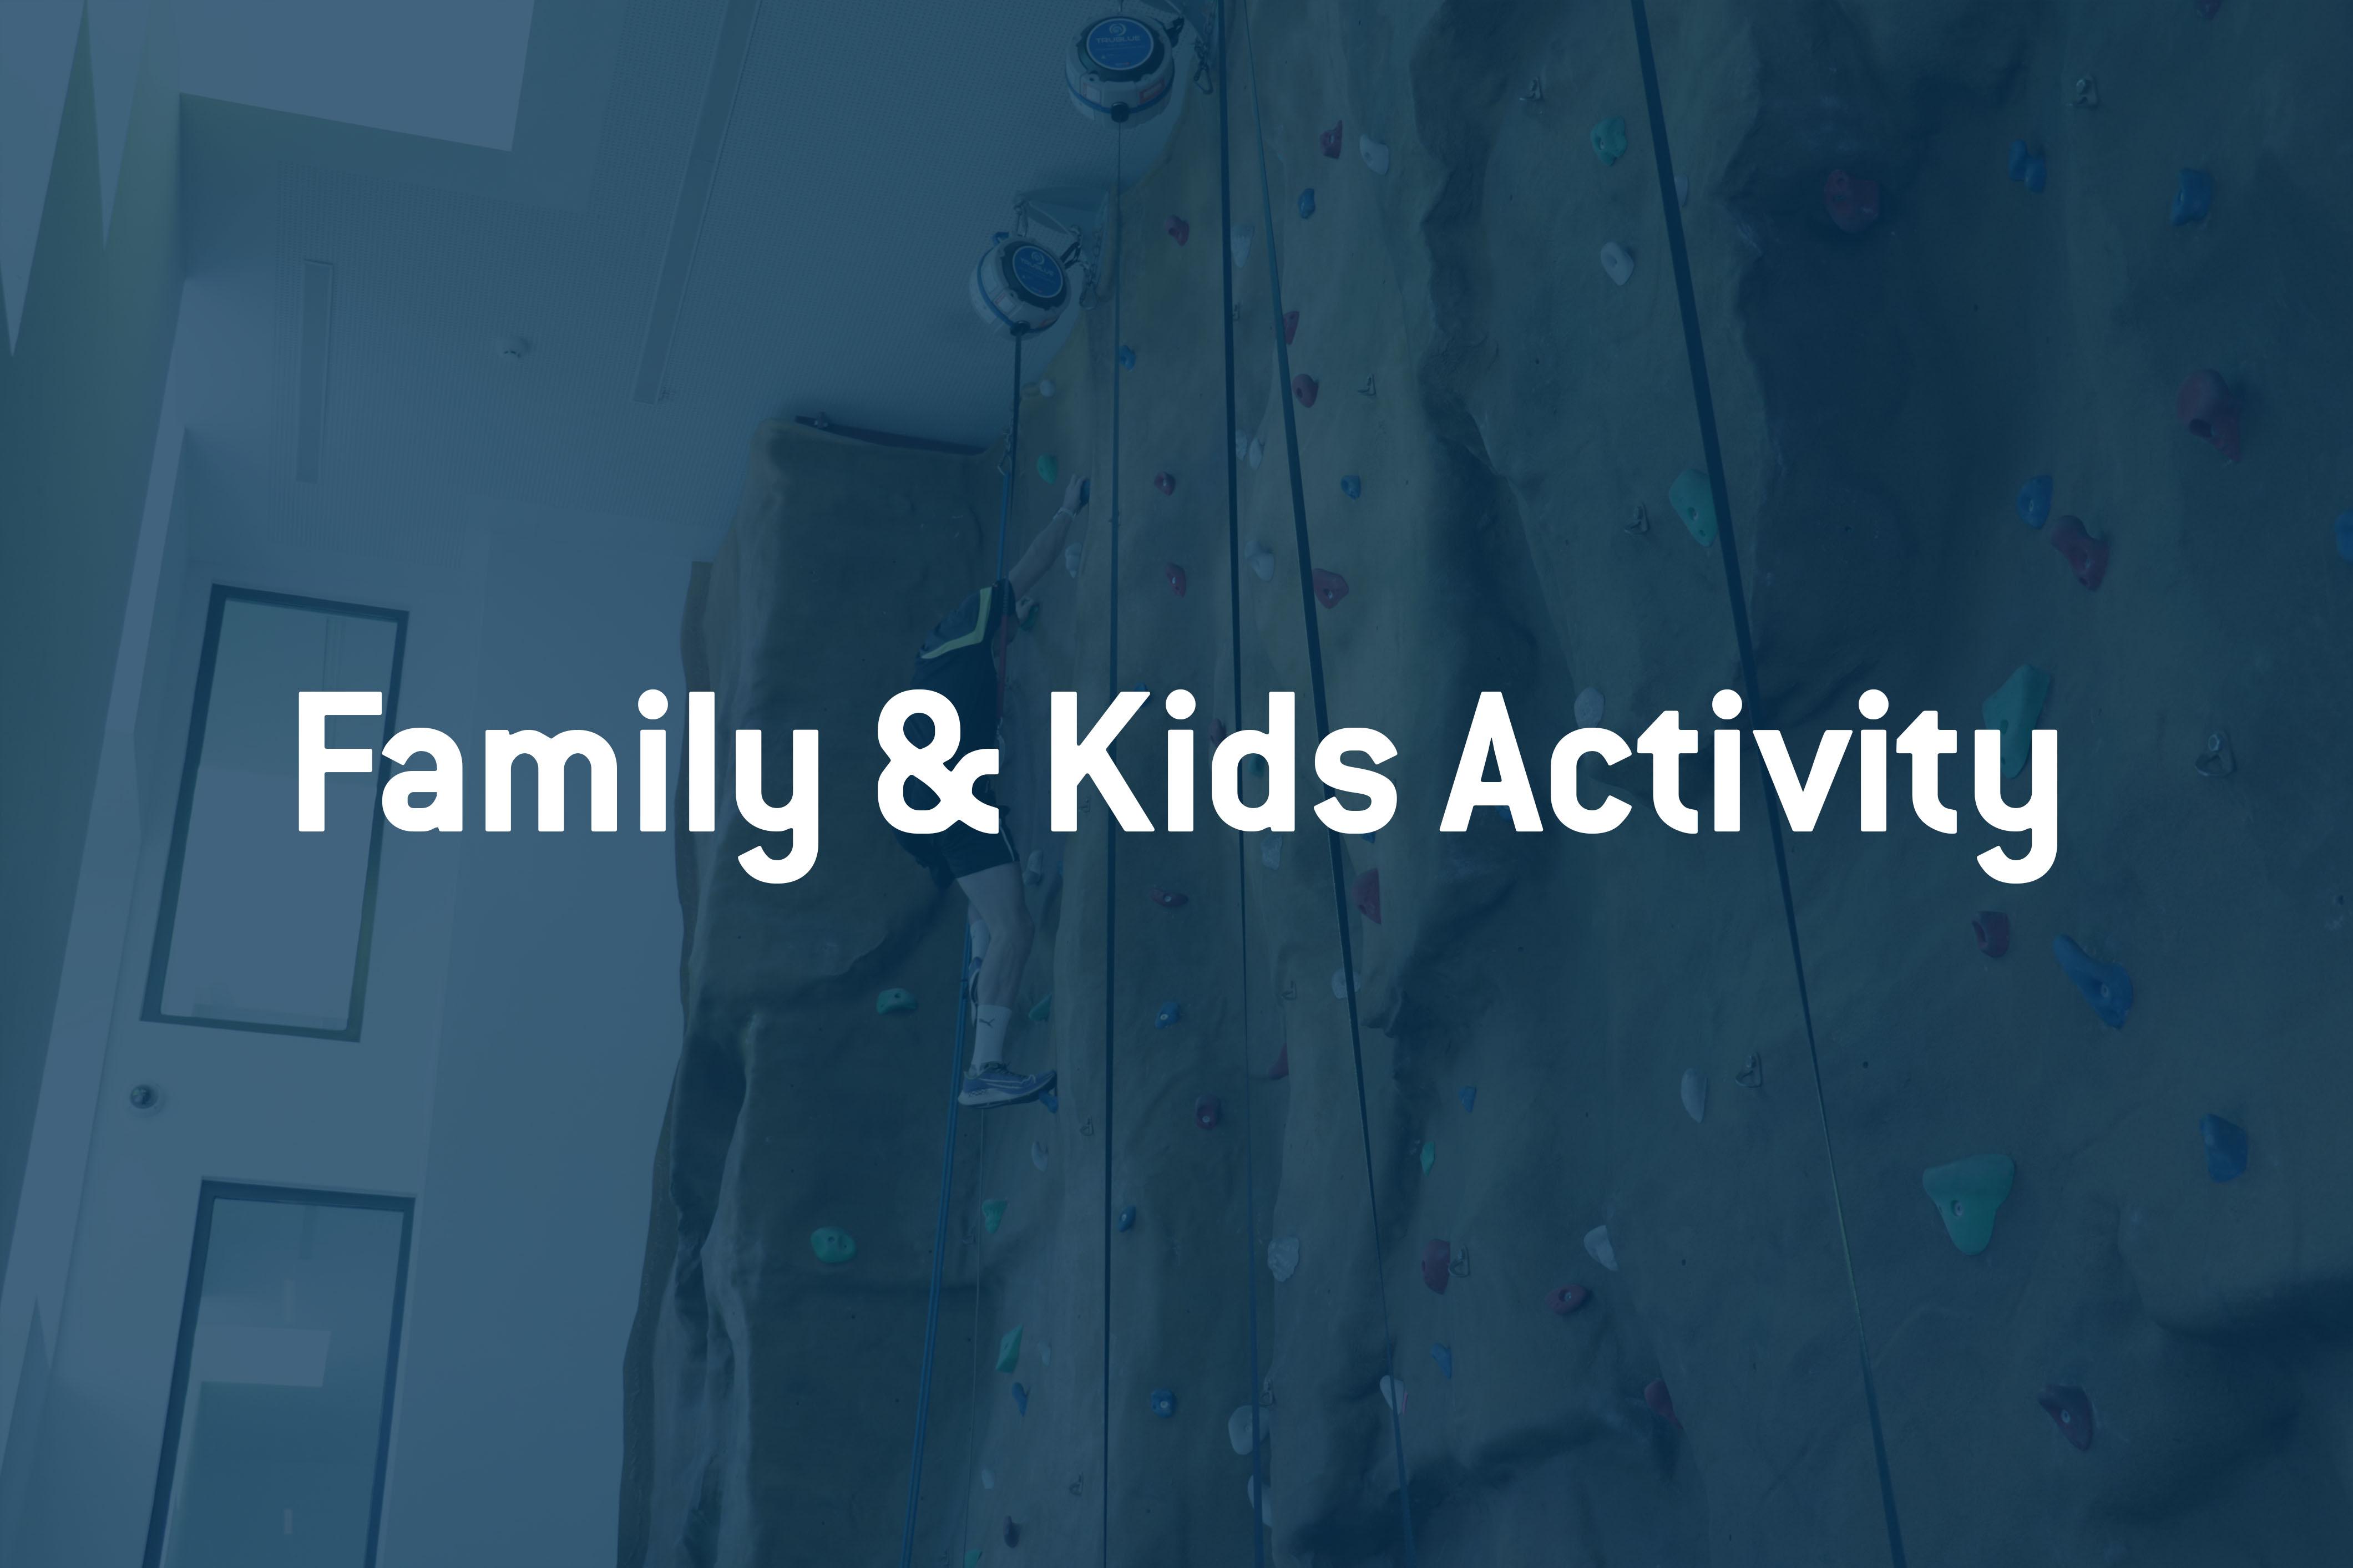 Family & Kids activity